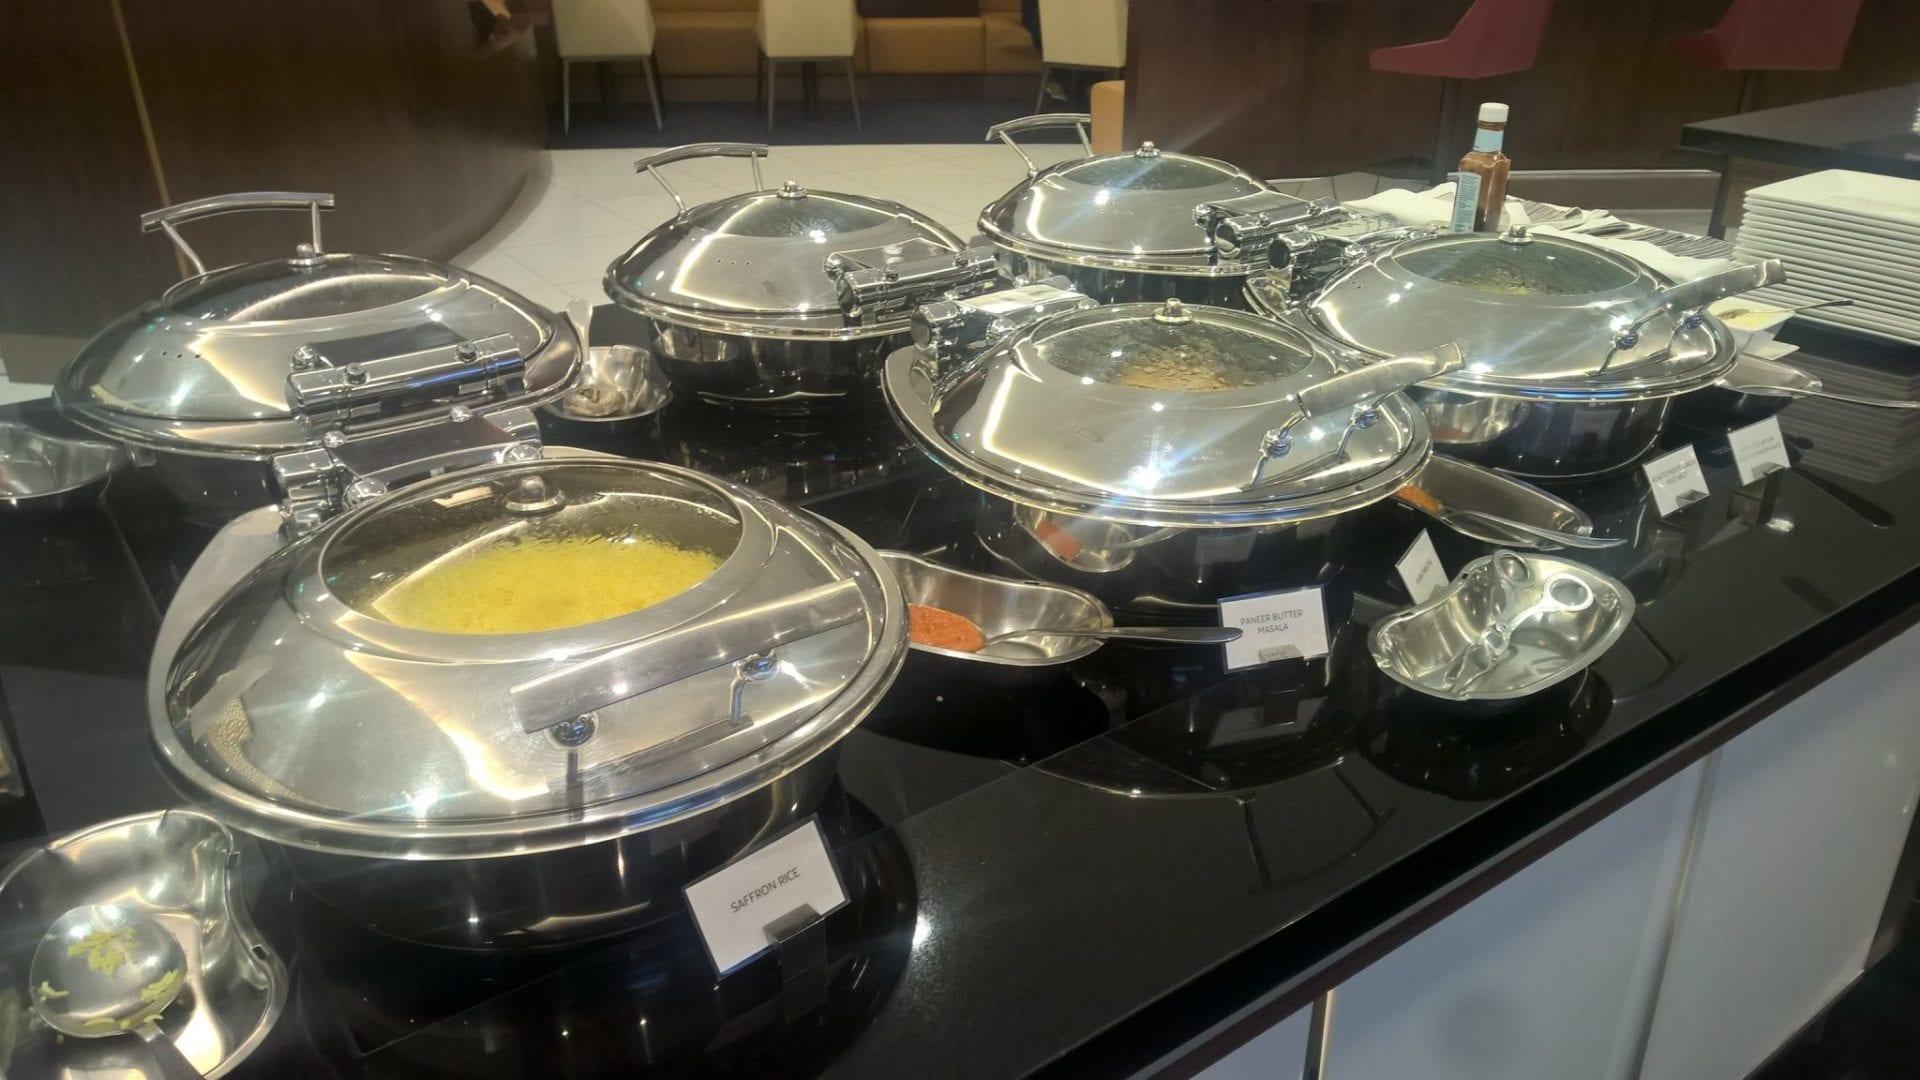 buffet-etihad-abu-dhabi-t1-new-5